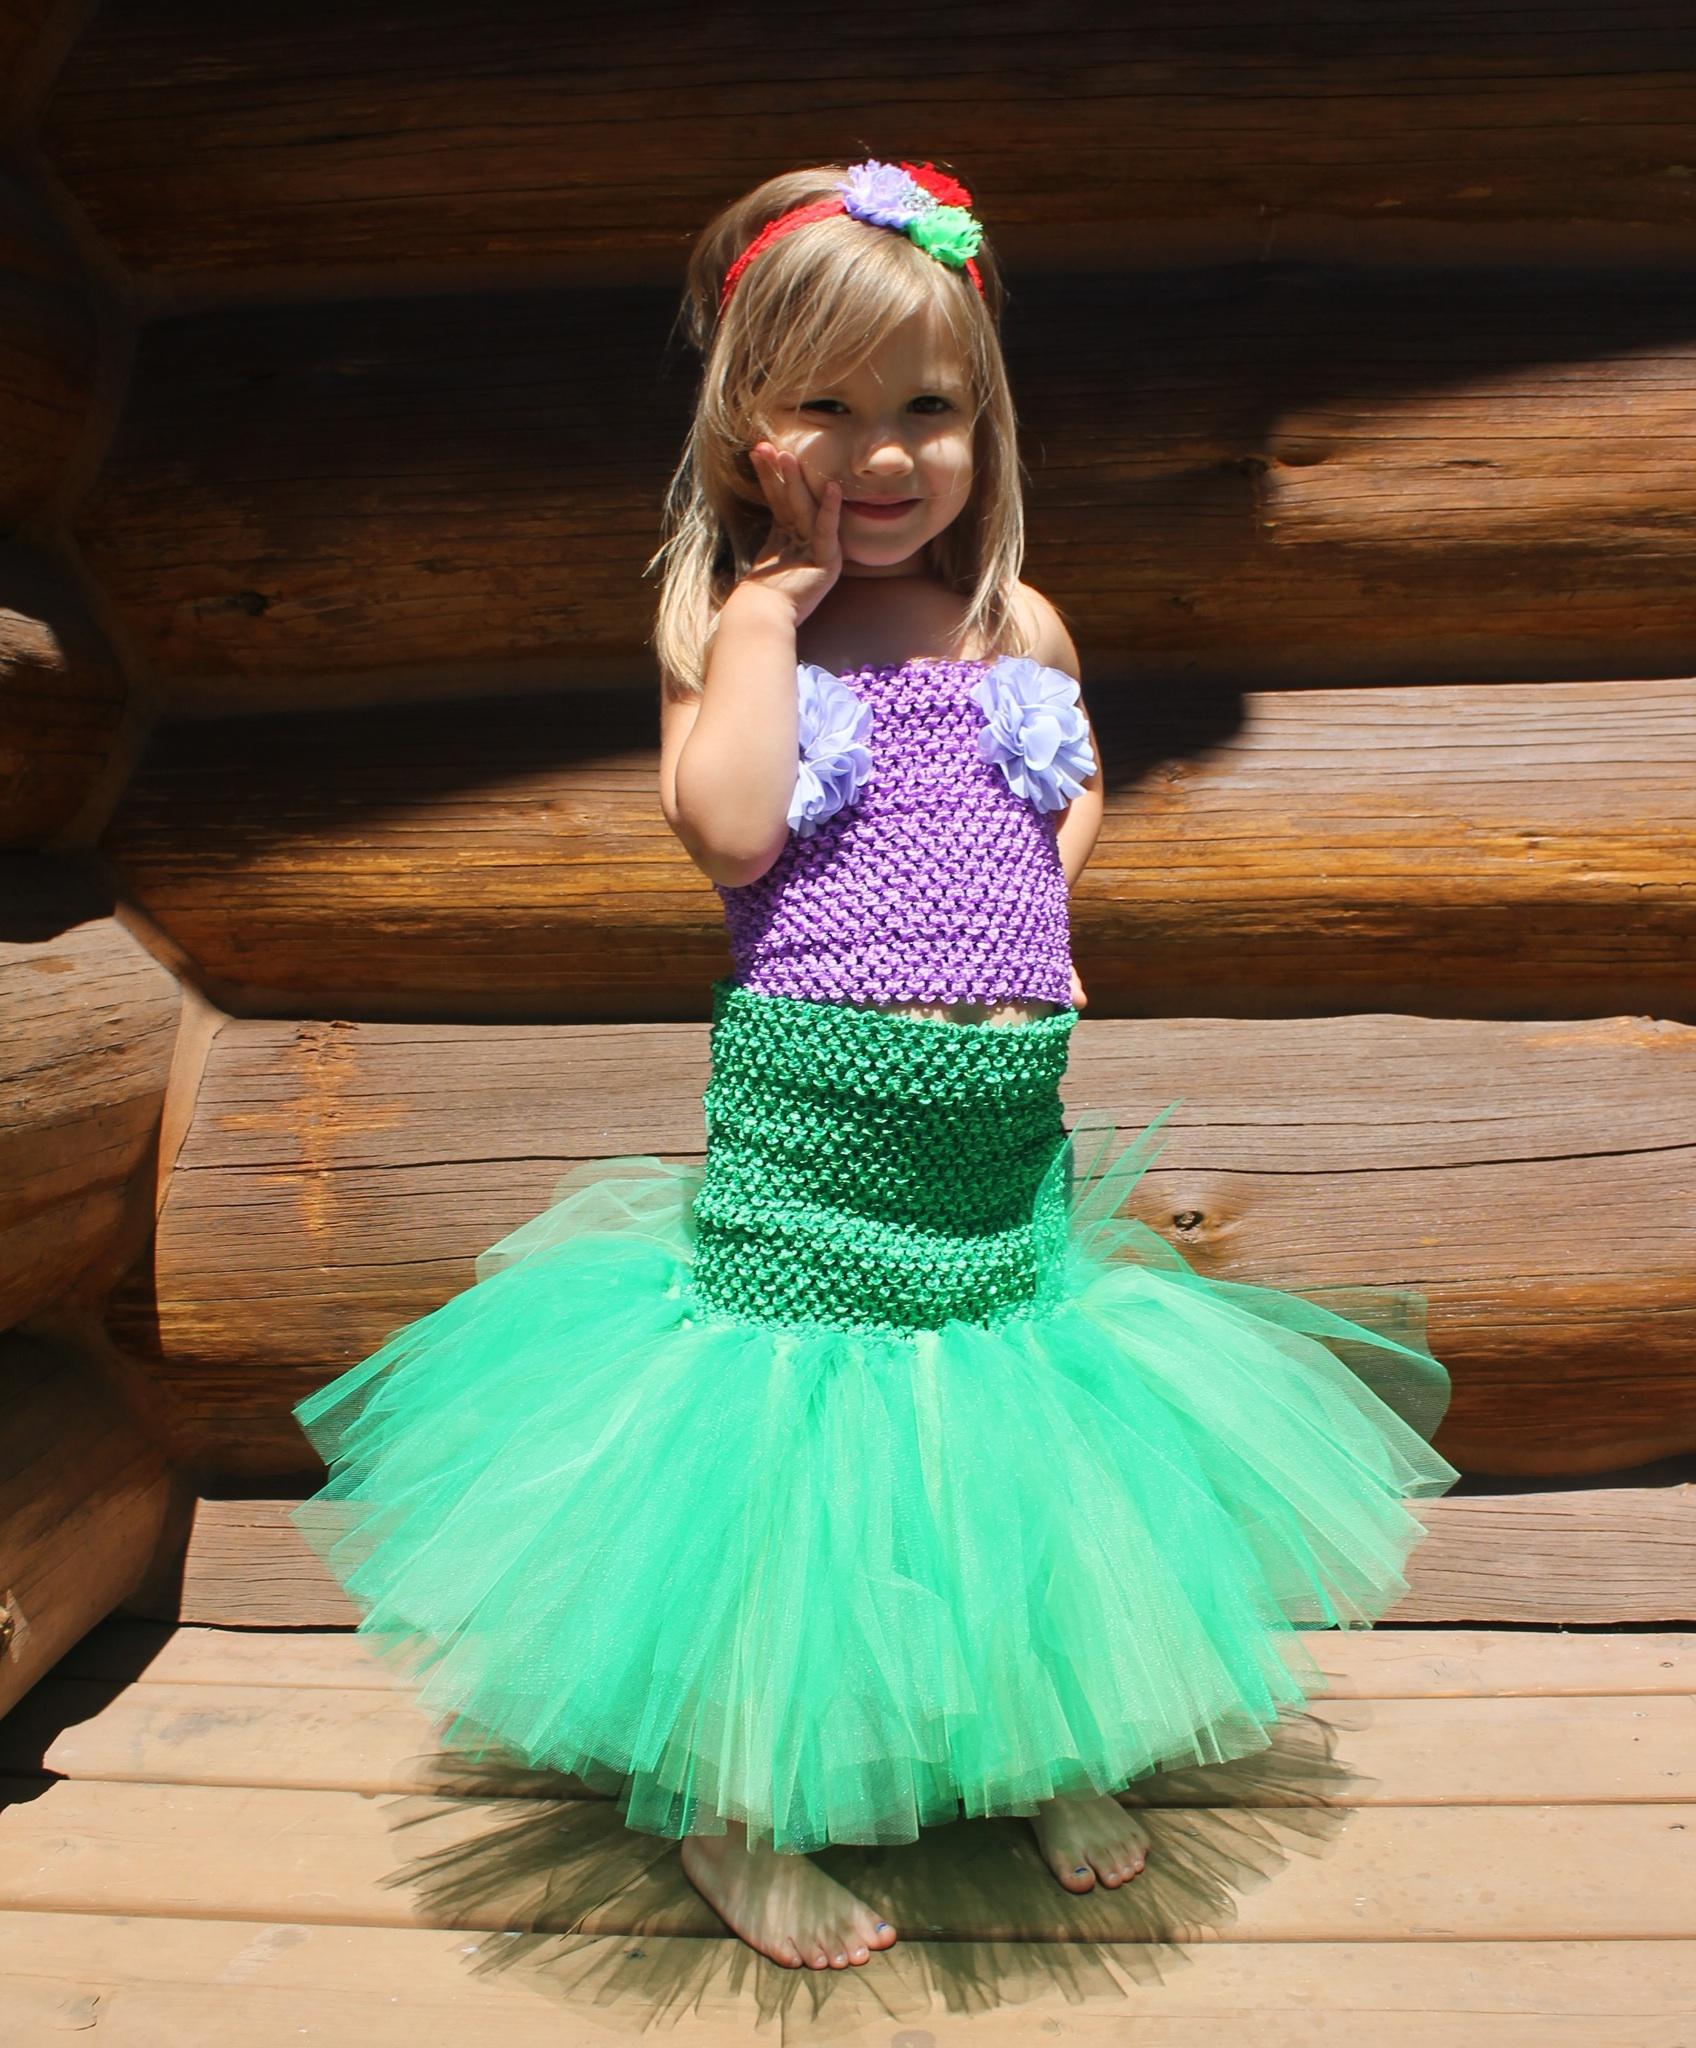 Mermaid Dress Tutorial - Hair Bow Company